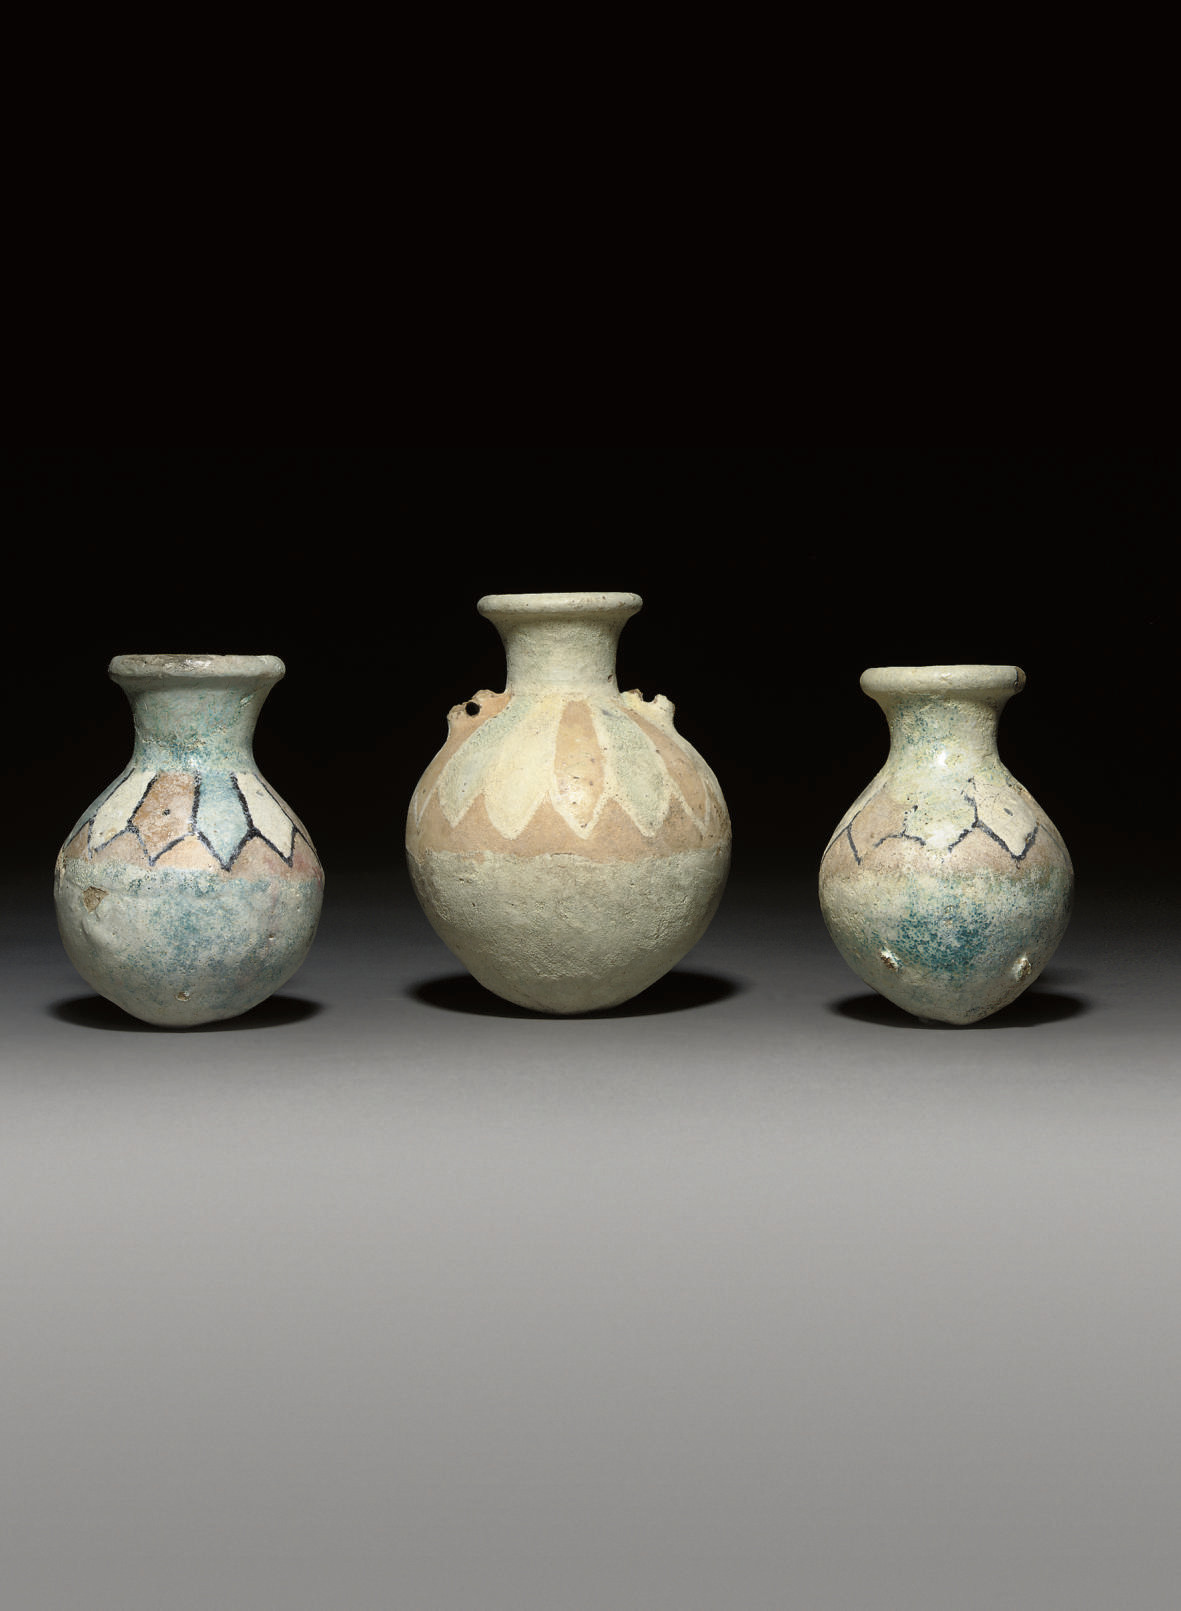 THREE NORTH-WEST PERSIAN 'ZIWI